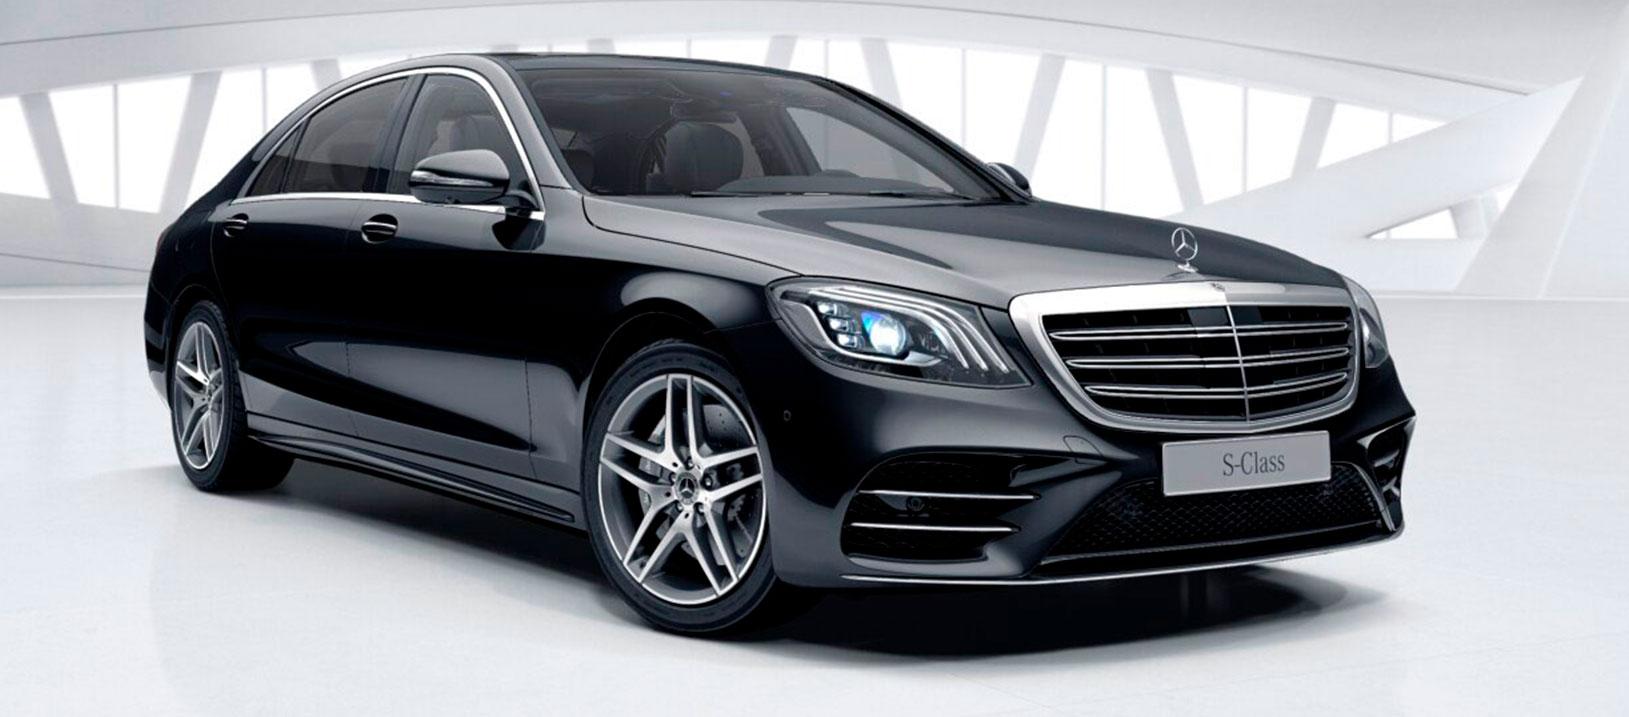 Mercedes-Benz S 400 d 4MATIC long 52600215